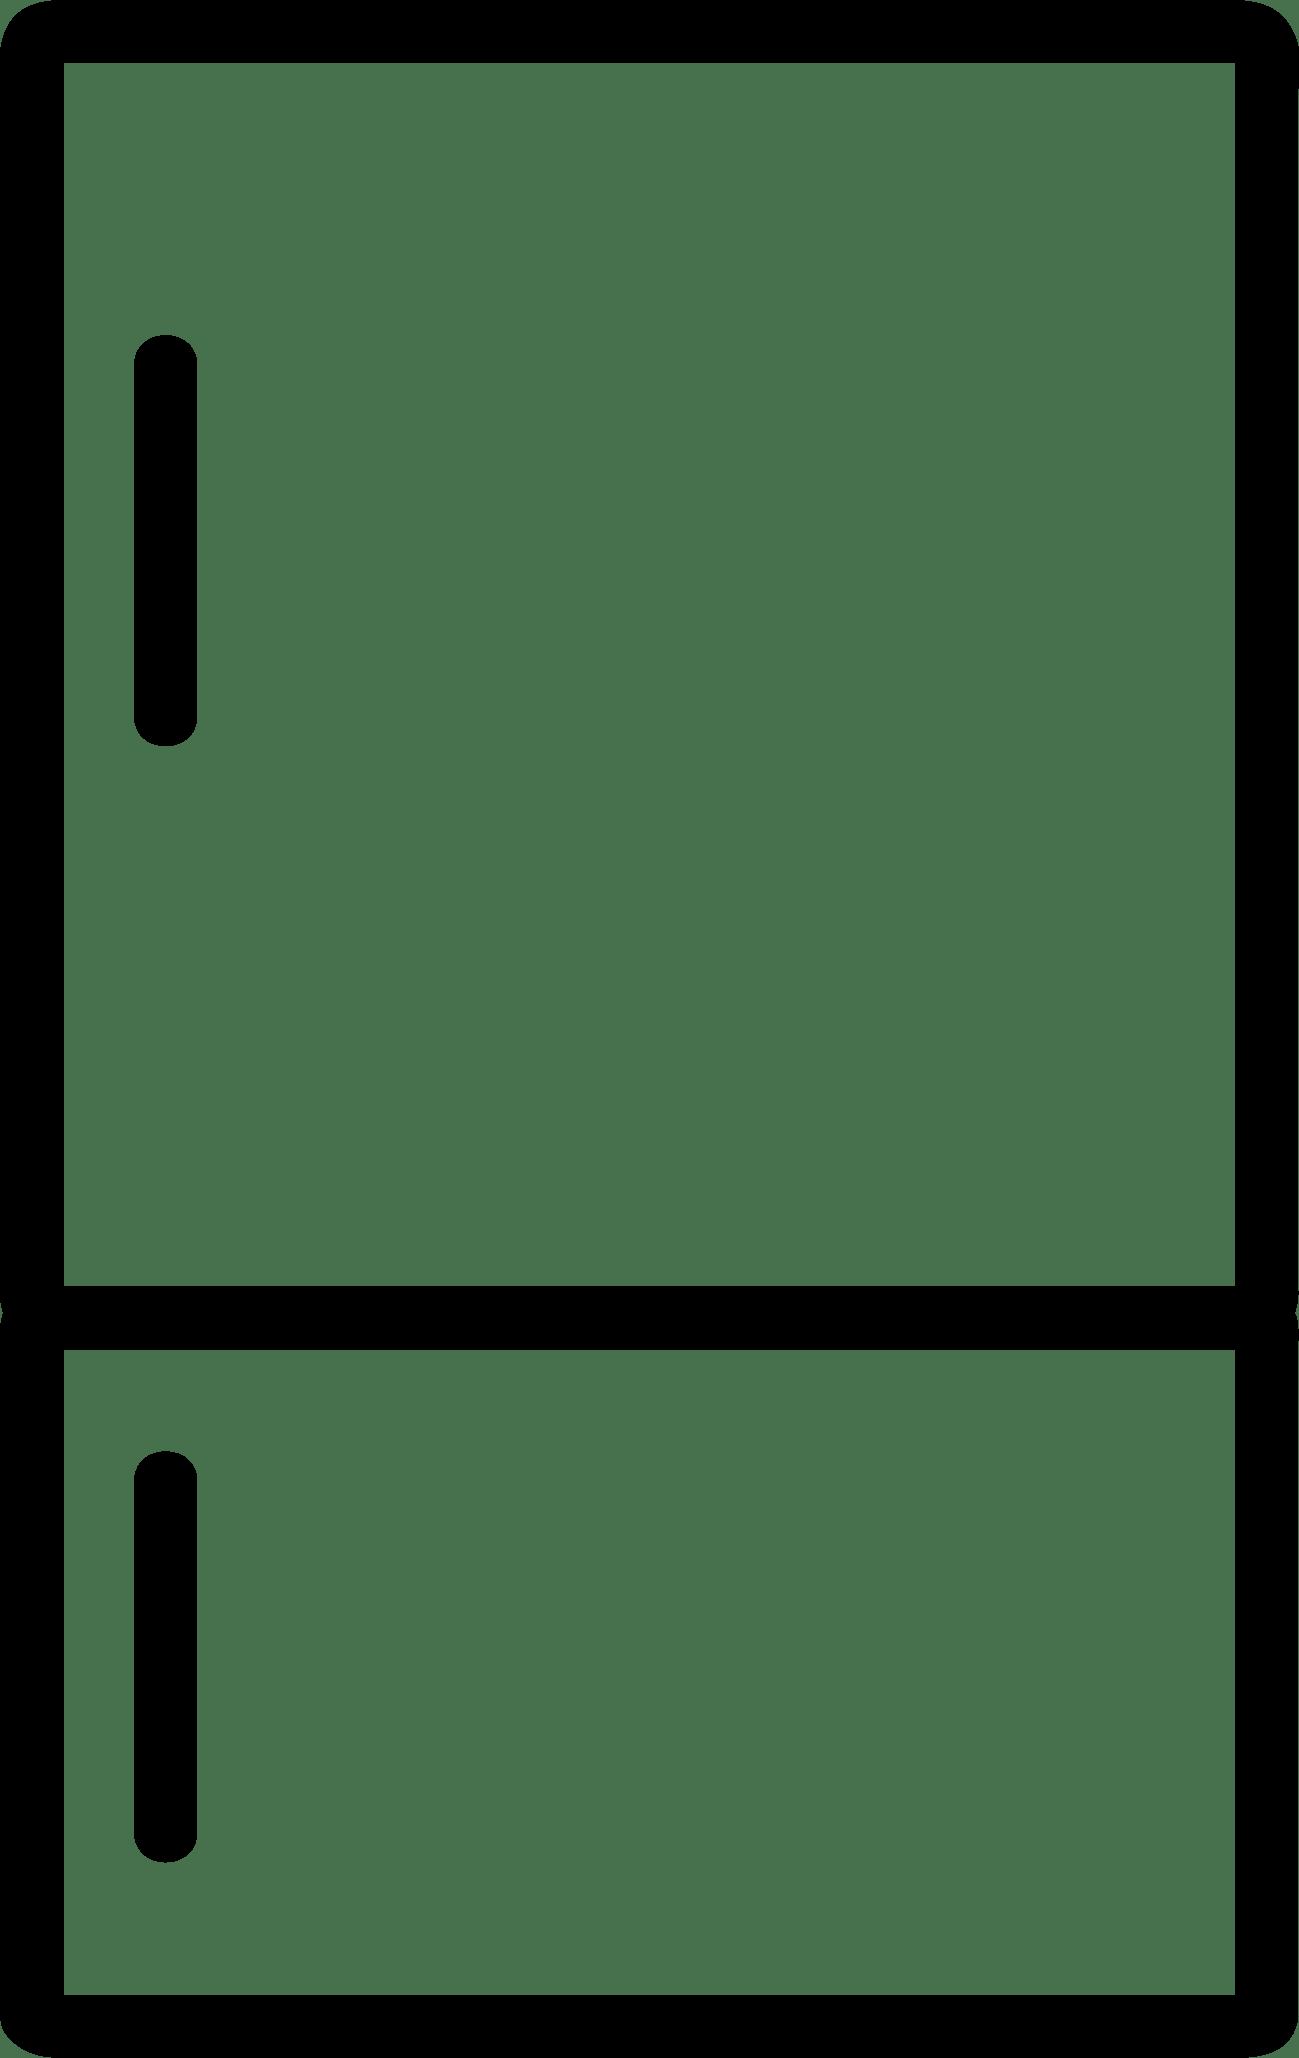 Hot Water Heater Reset Button Stuck : water, heater, reset, button, stuck, Homepage, Premium, Range, Chimney, Built-in, Appliances